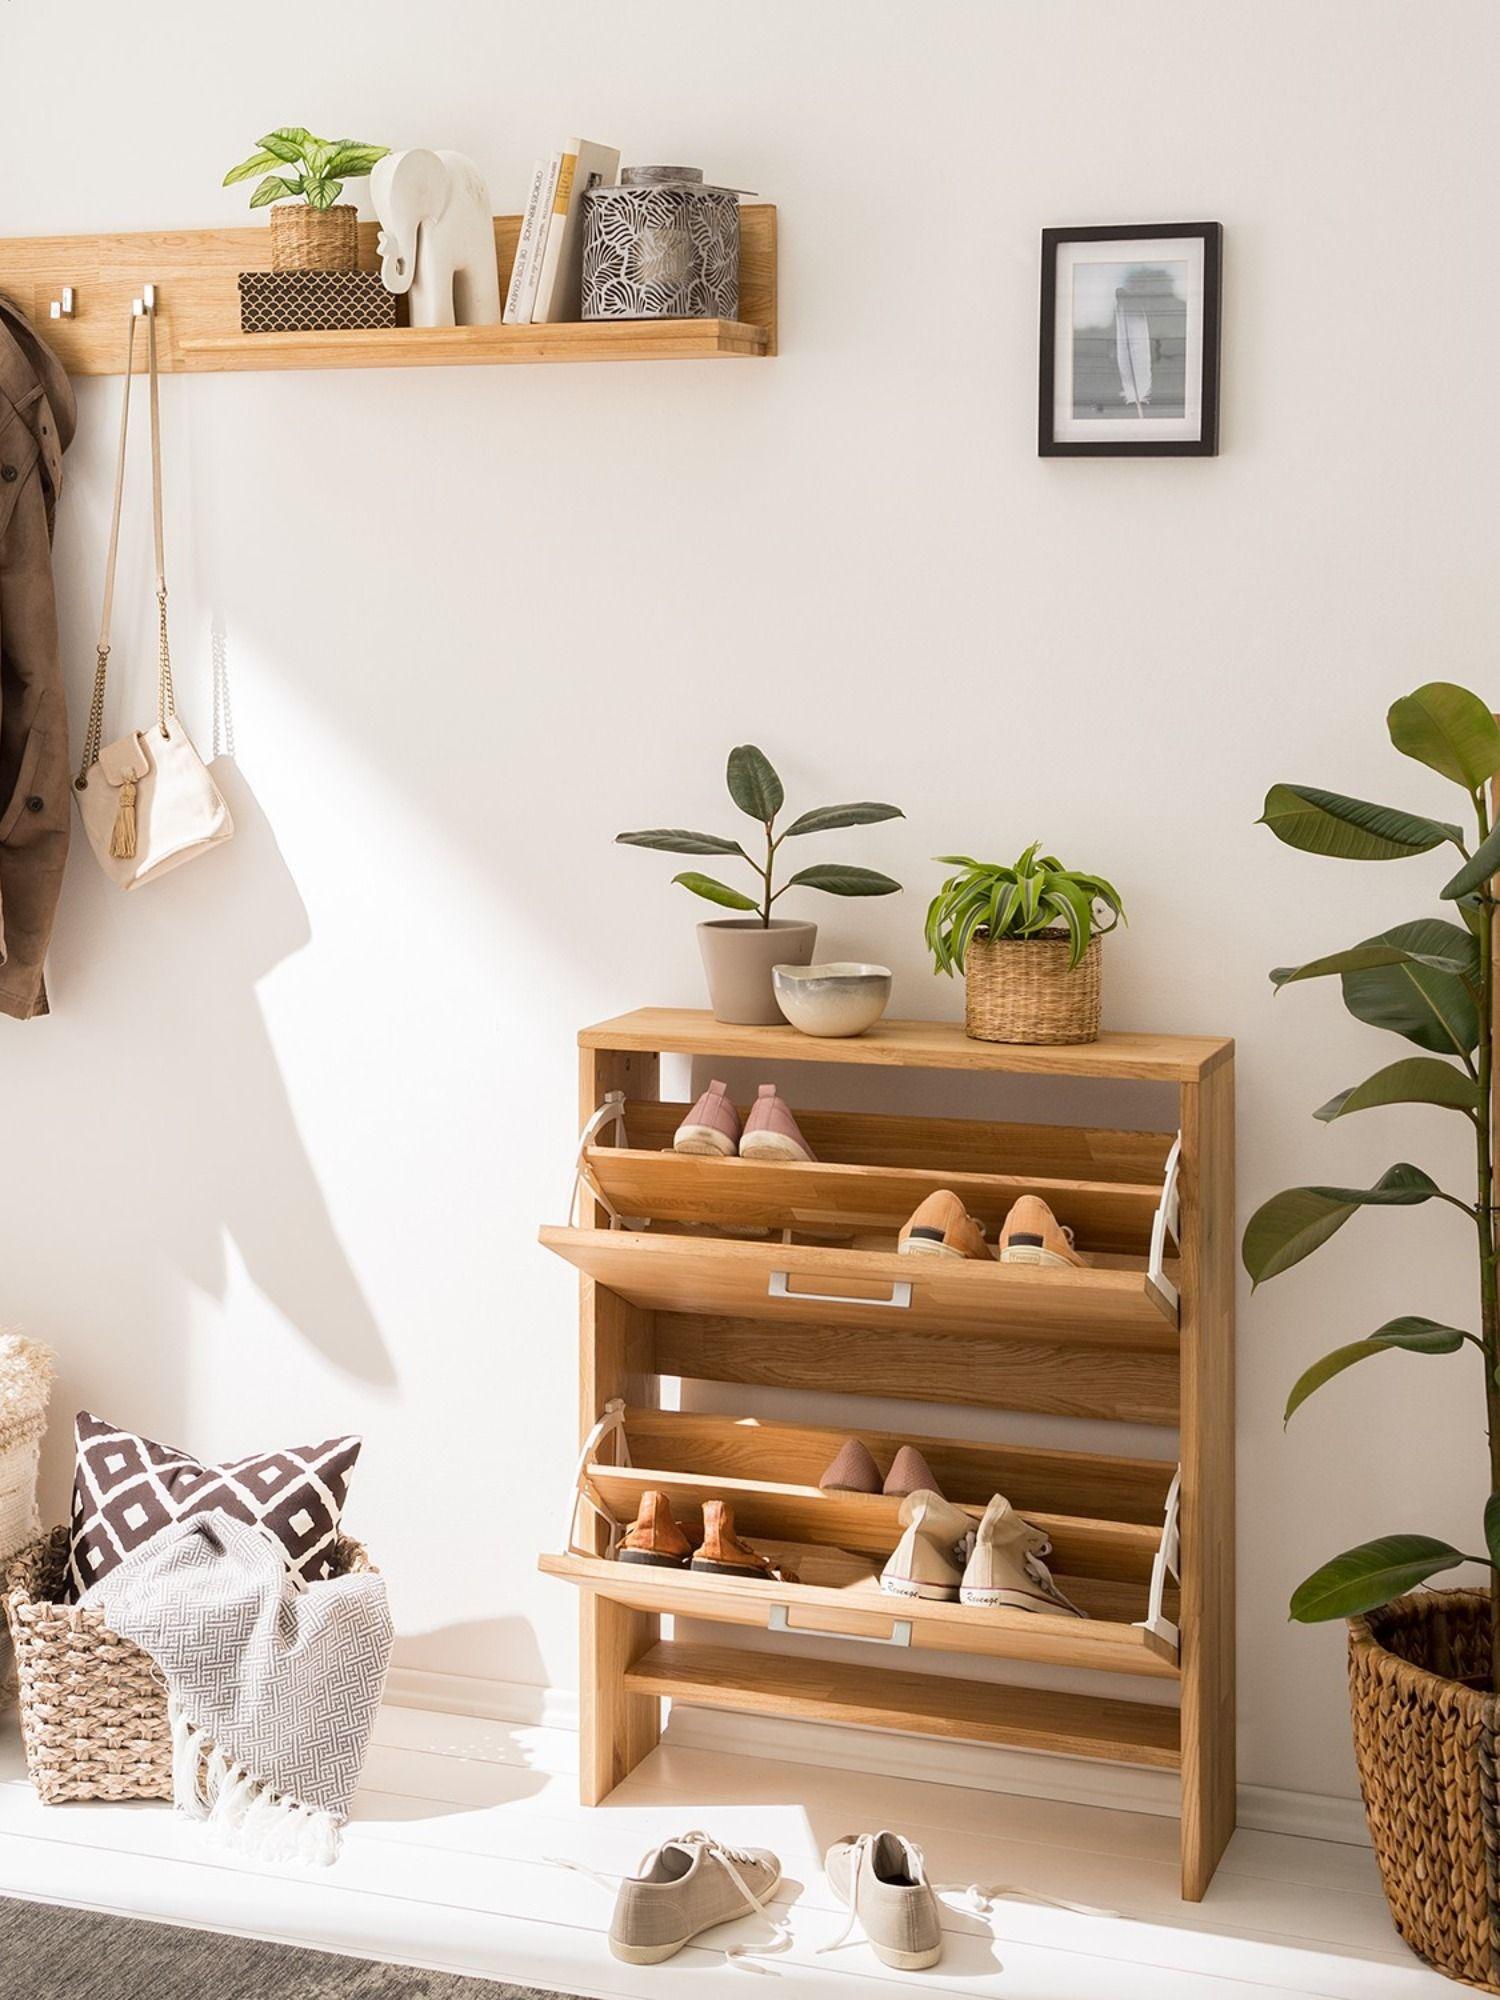 Schuhkipper Fawood Kaufen Home24 Echtholz Möbel Naturfarben Natural Living